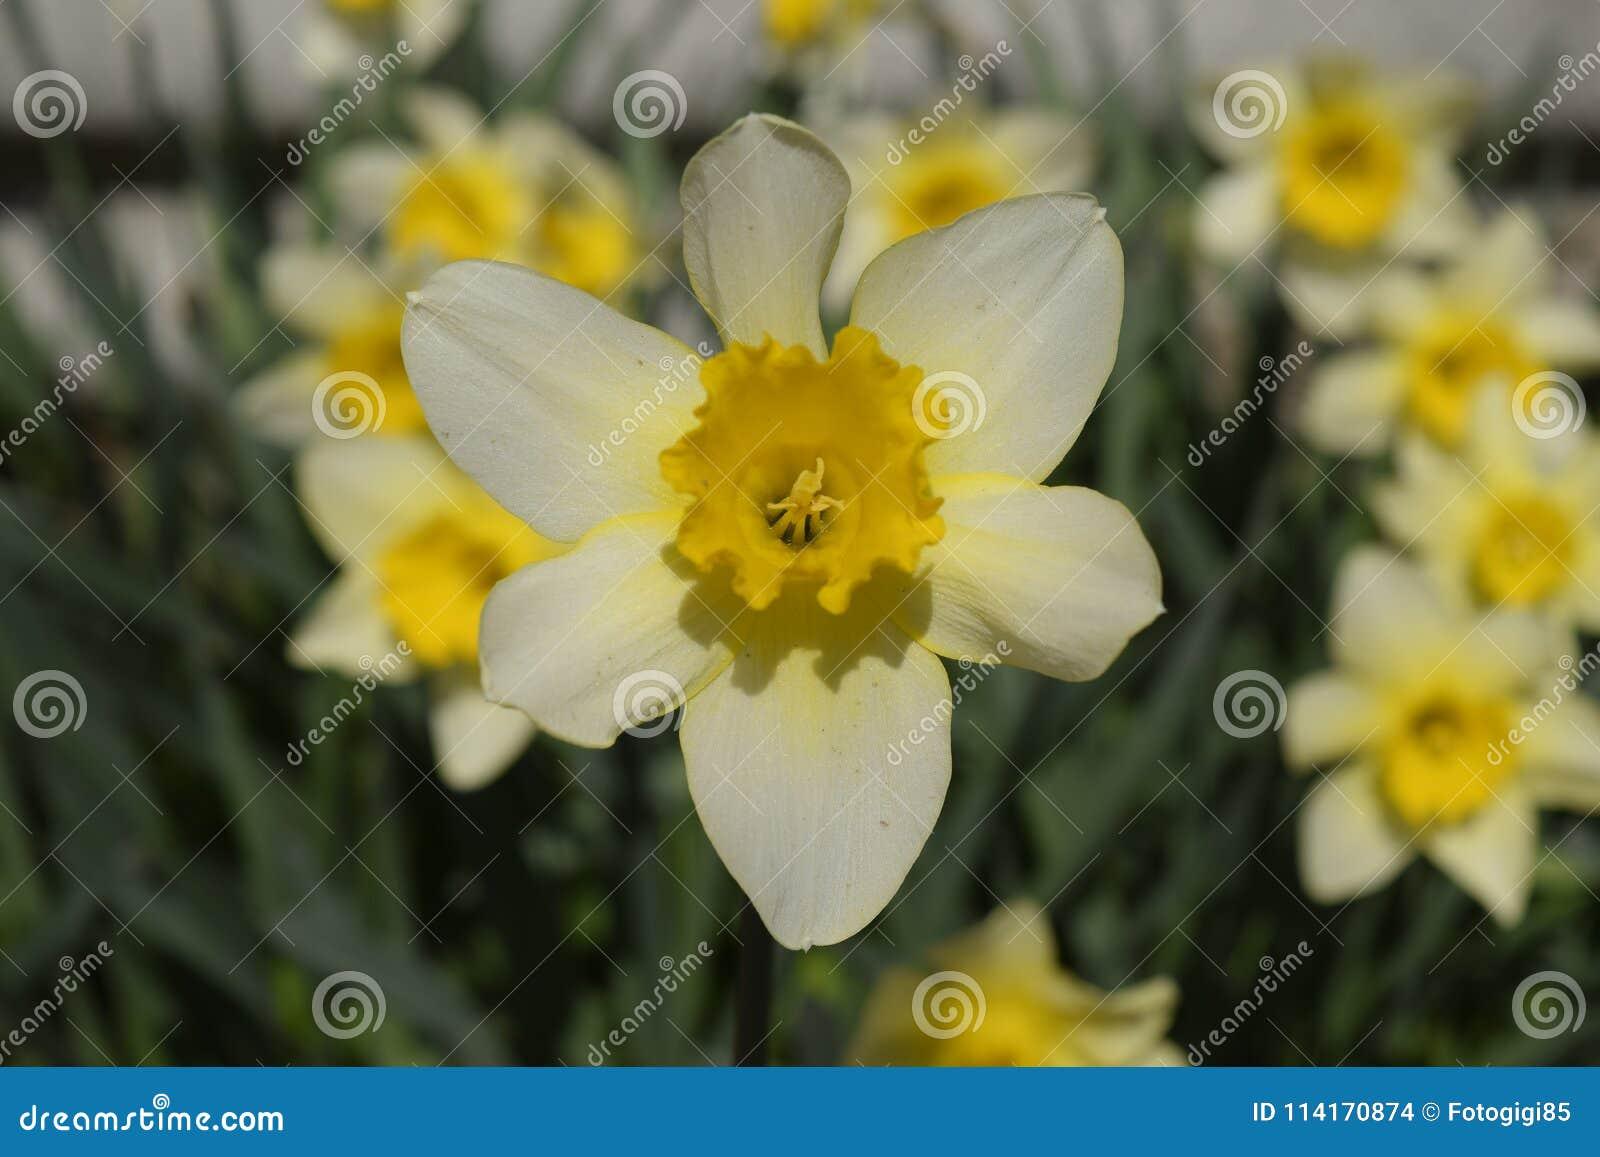 Spring Flowering Bulb Plants In The Flowerbed Flowers Daffodil